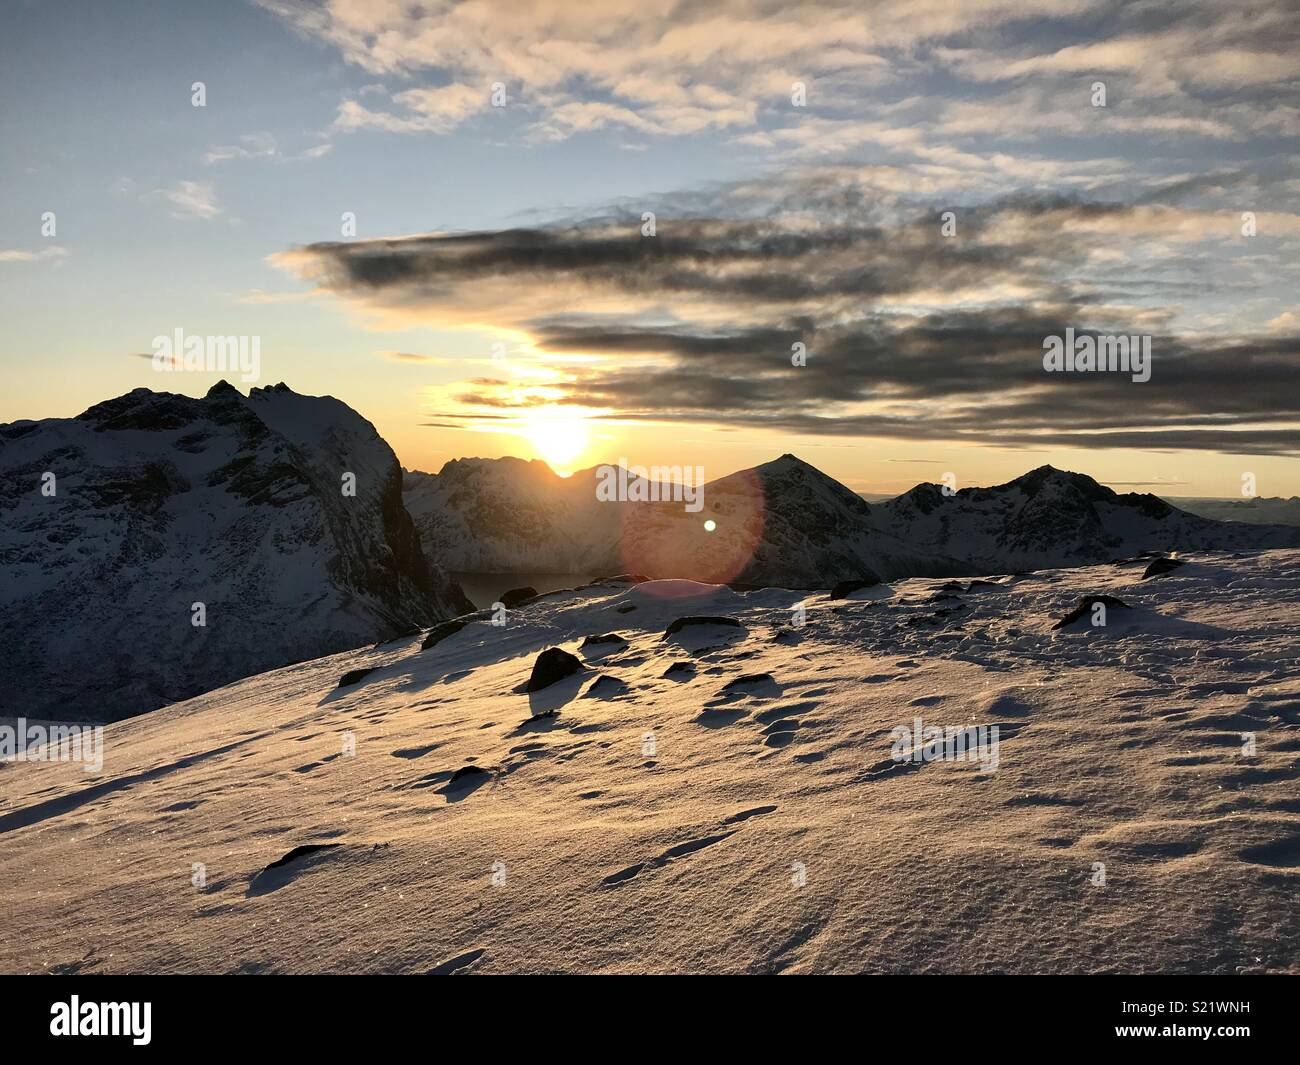 Norway mountains sunset - Stock Image